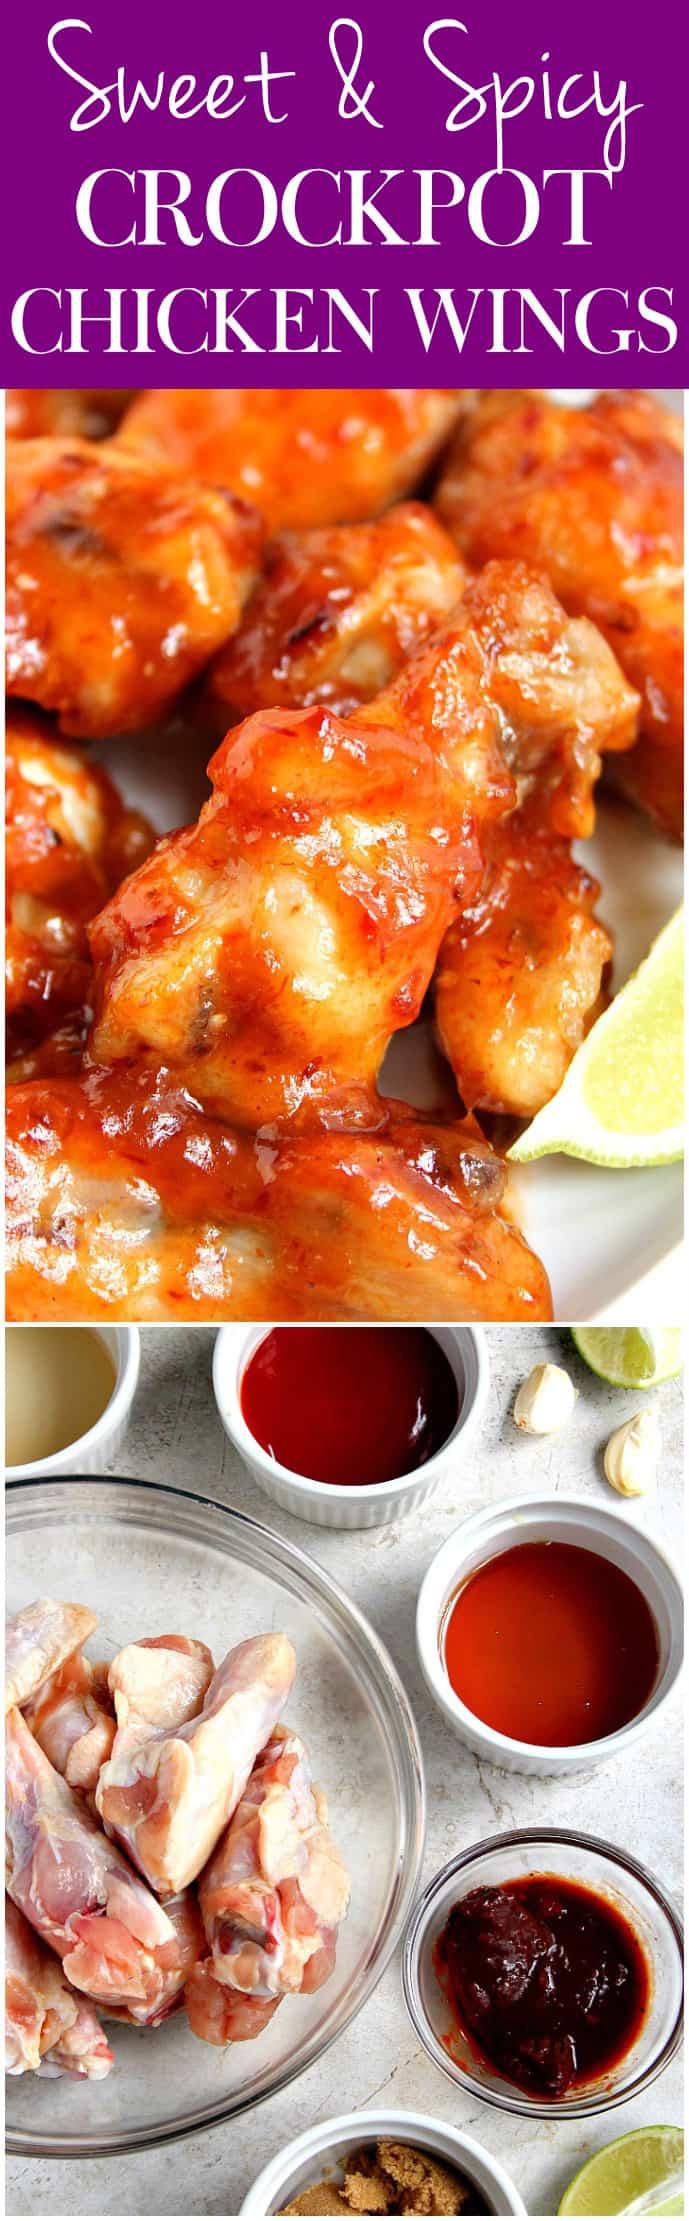 crockpot chicken wings longA Sweet and Spicy Crock Pot® Chicken Wings Recipe